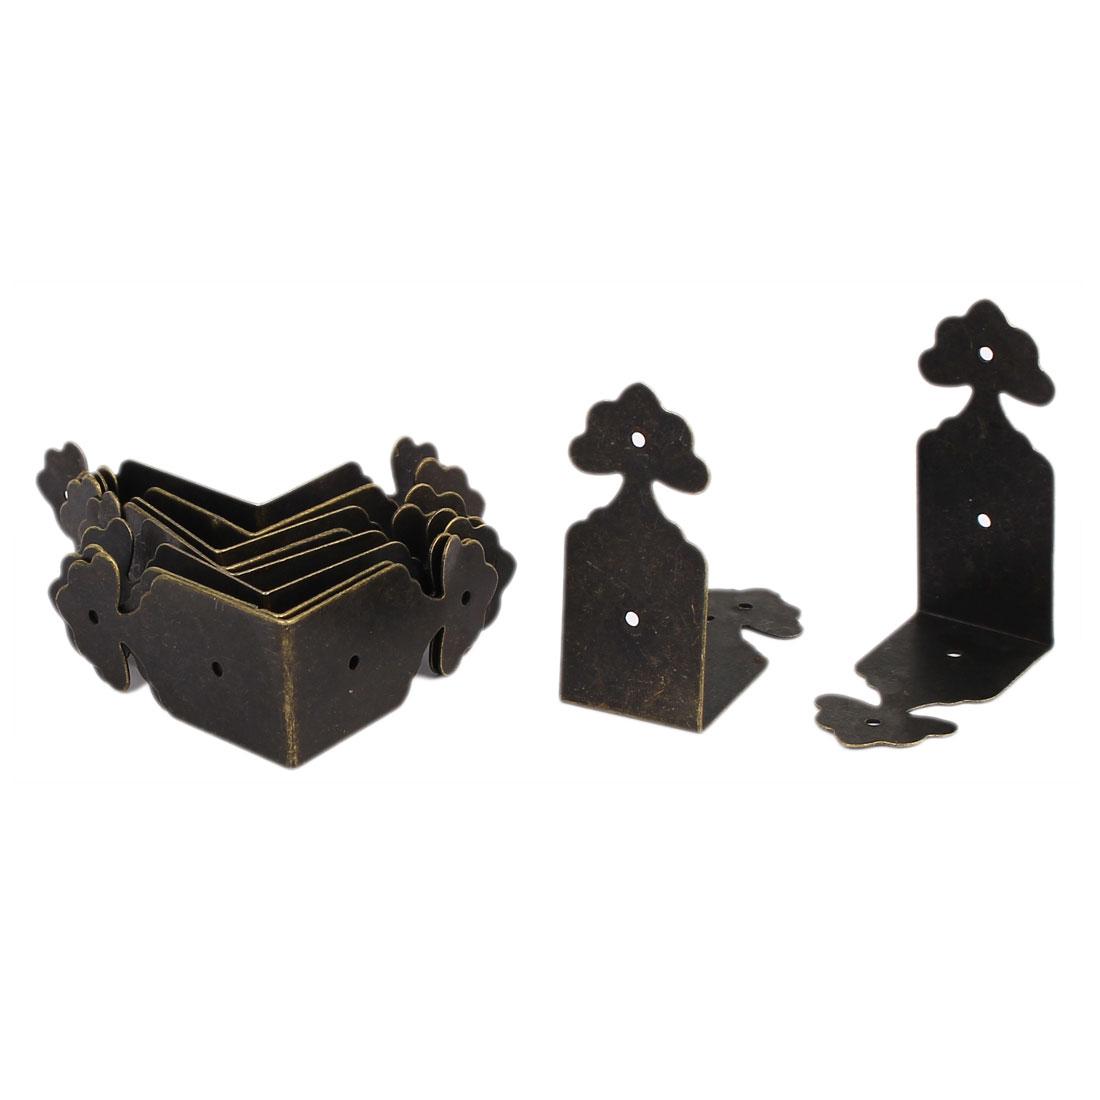 39mm x 18mm Antique Style Box Desk Edge Cover Corner Protector Bronze Tone 10PCS